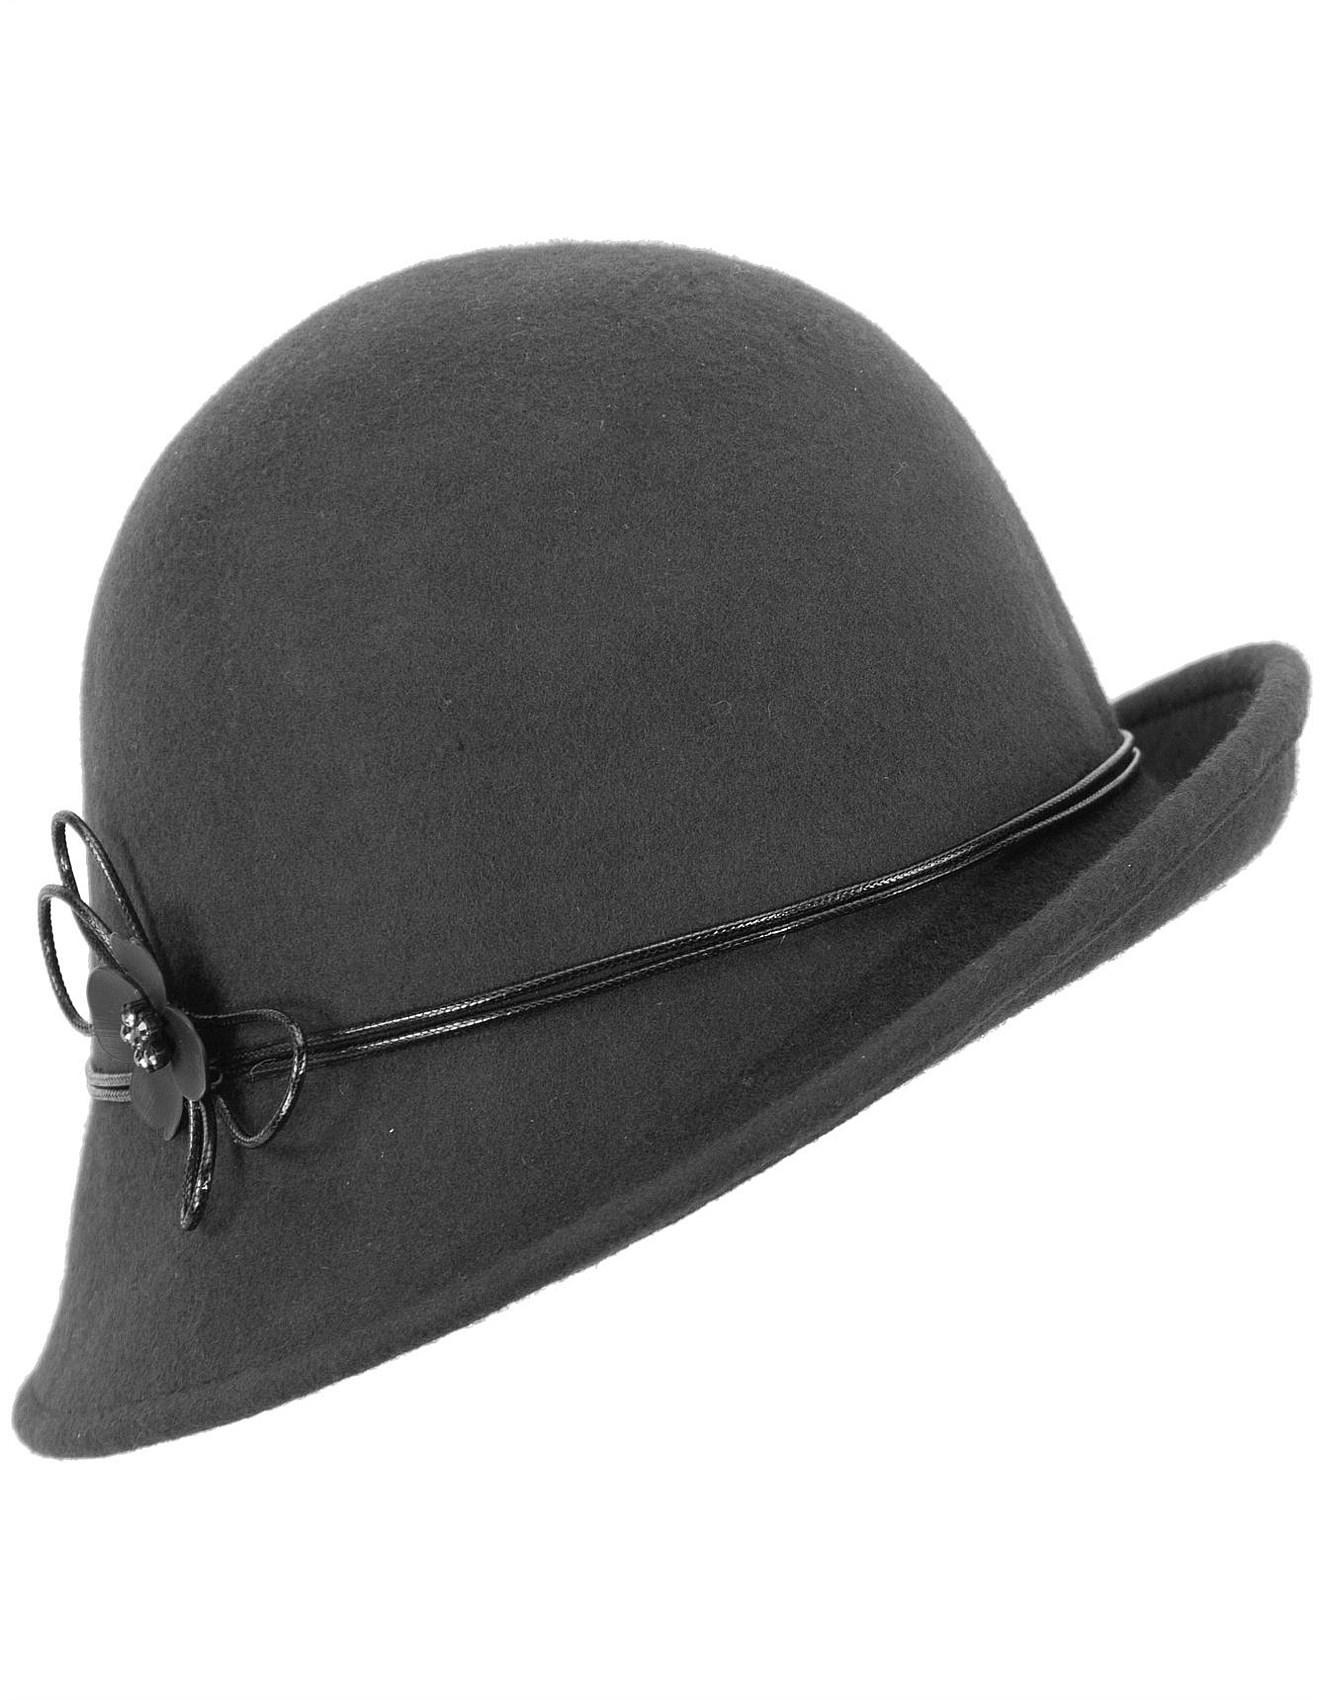 37957f33484d0 Women - Black felt cloche hat with buckle